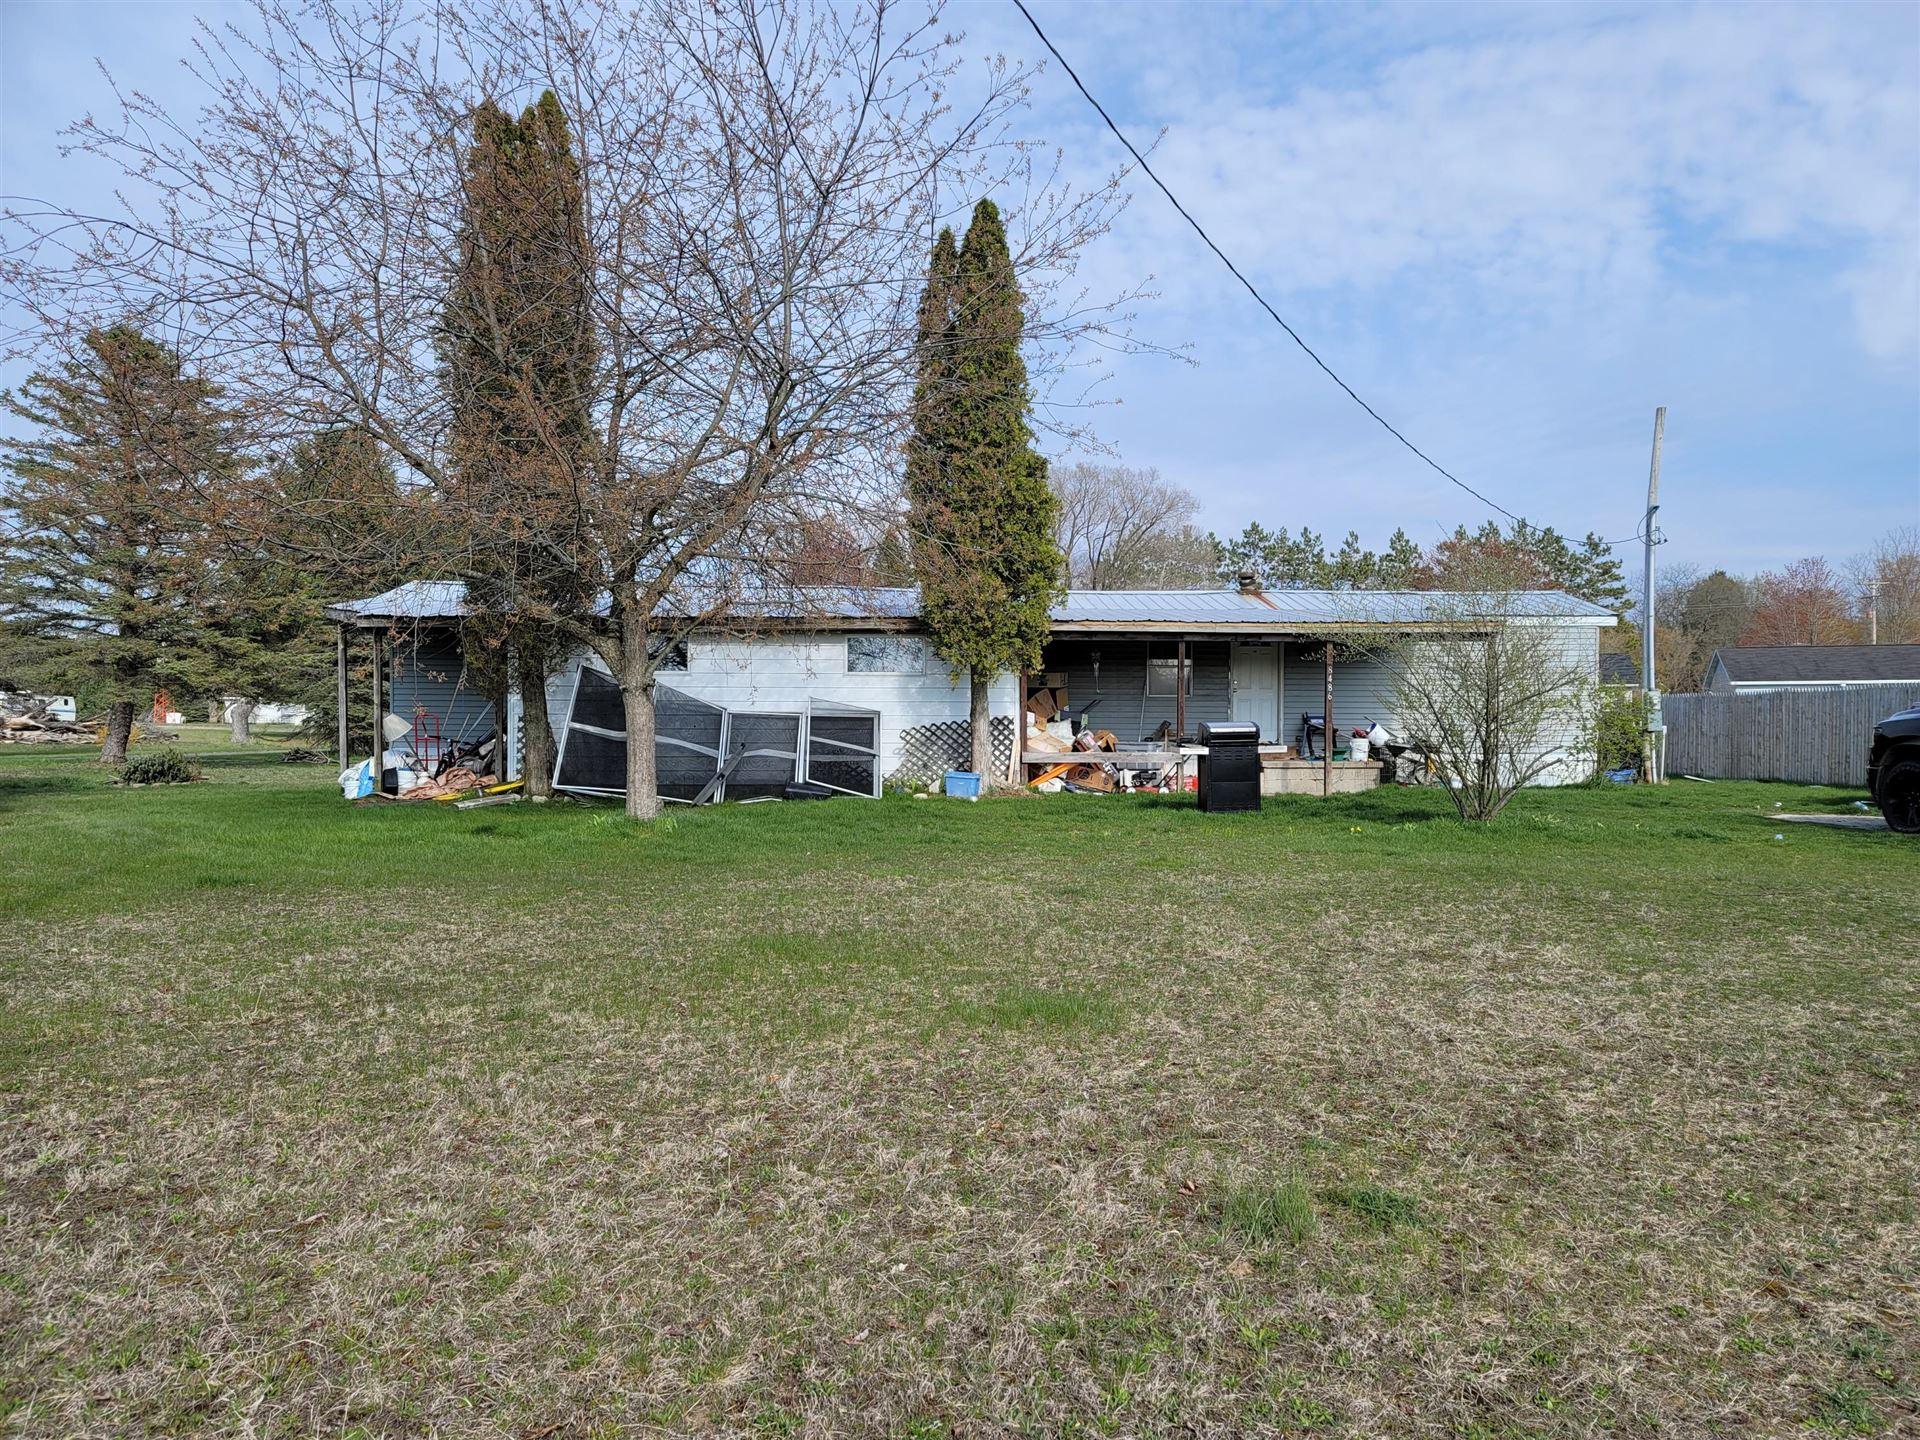 8486 N Custer Road, Free Soil, MI 49411 - MLS#: 21013958